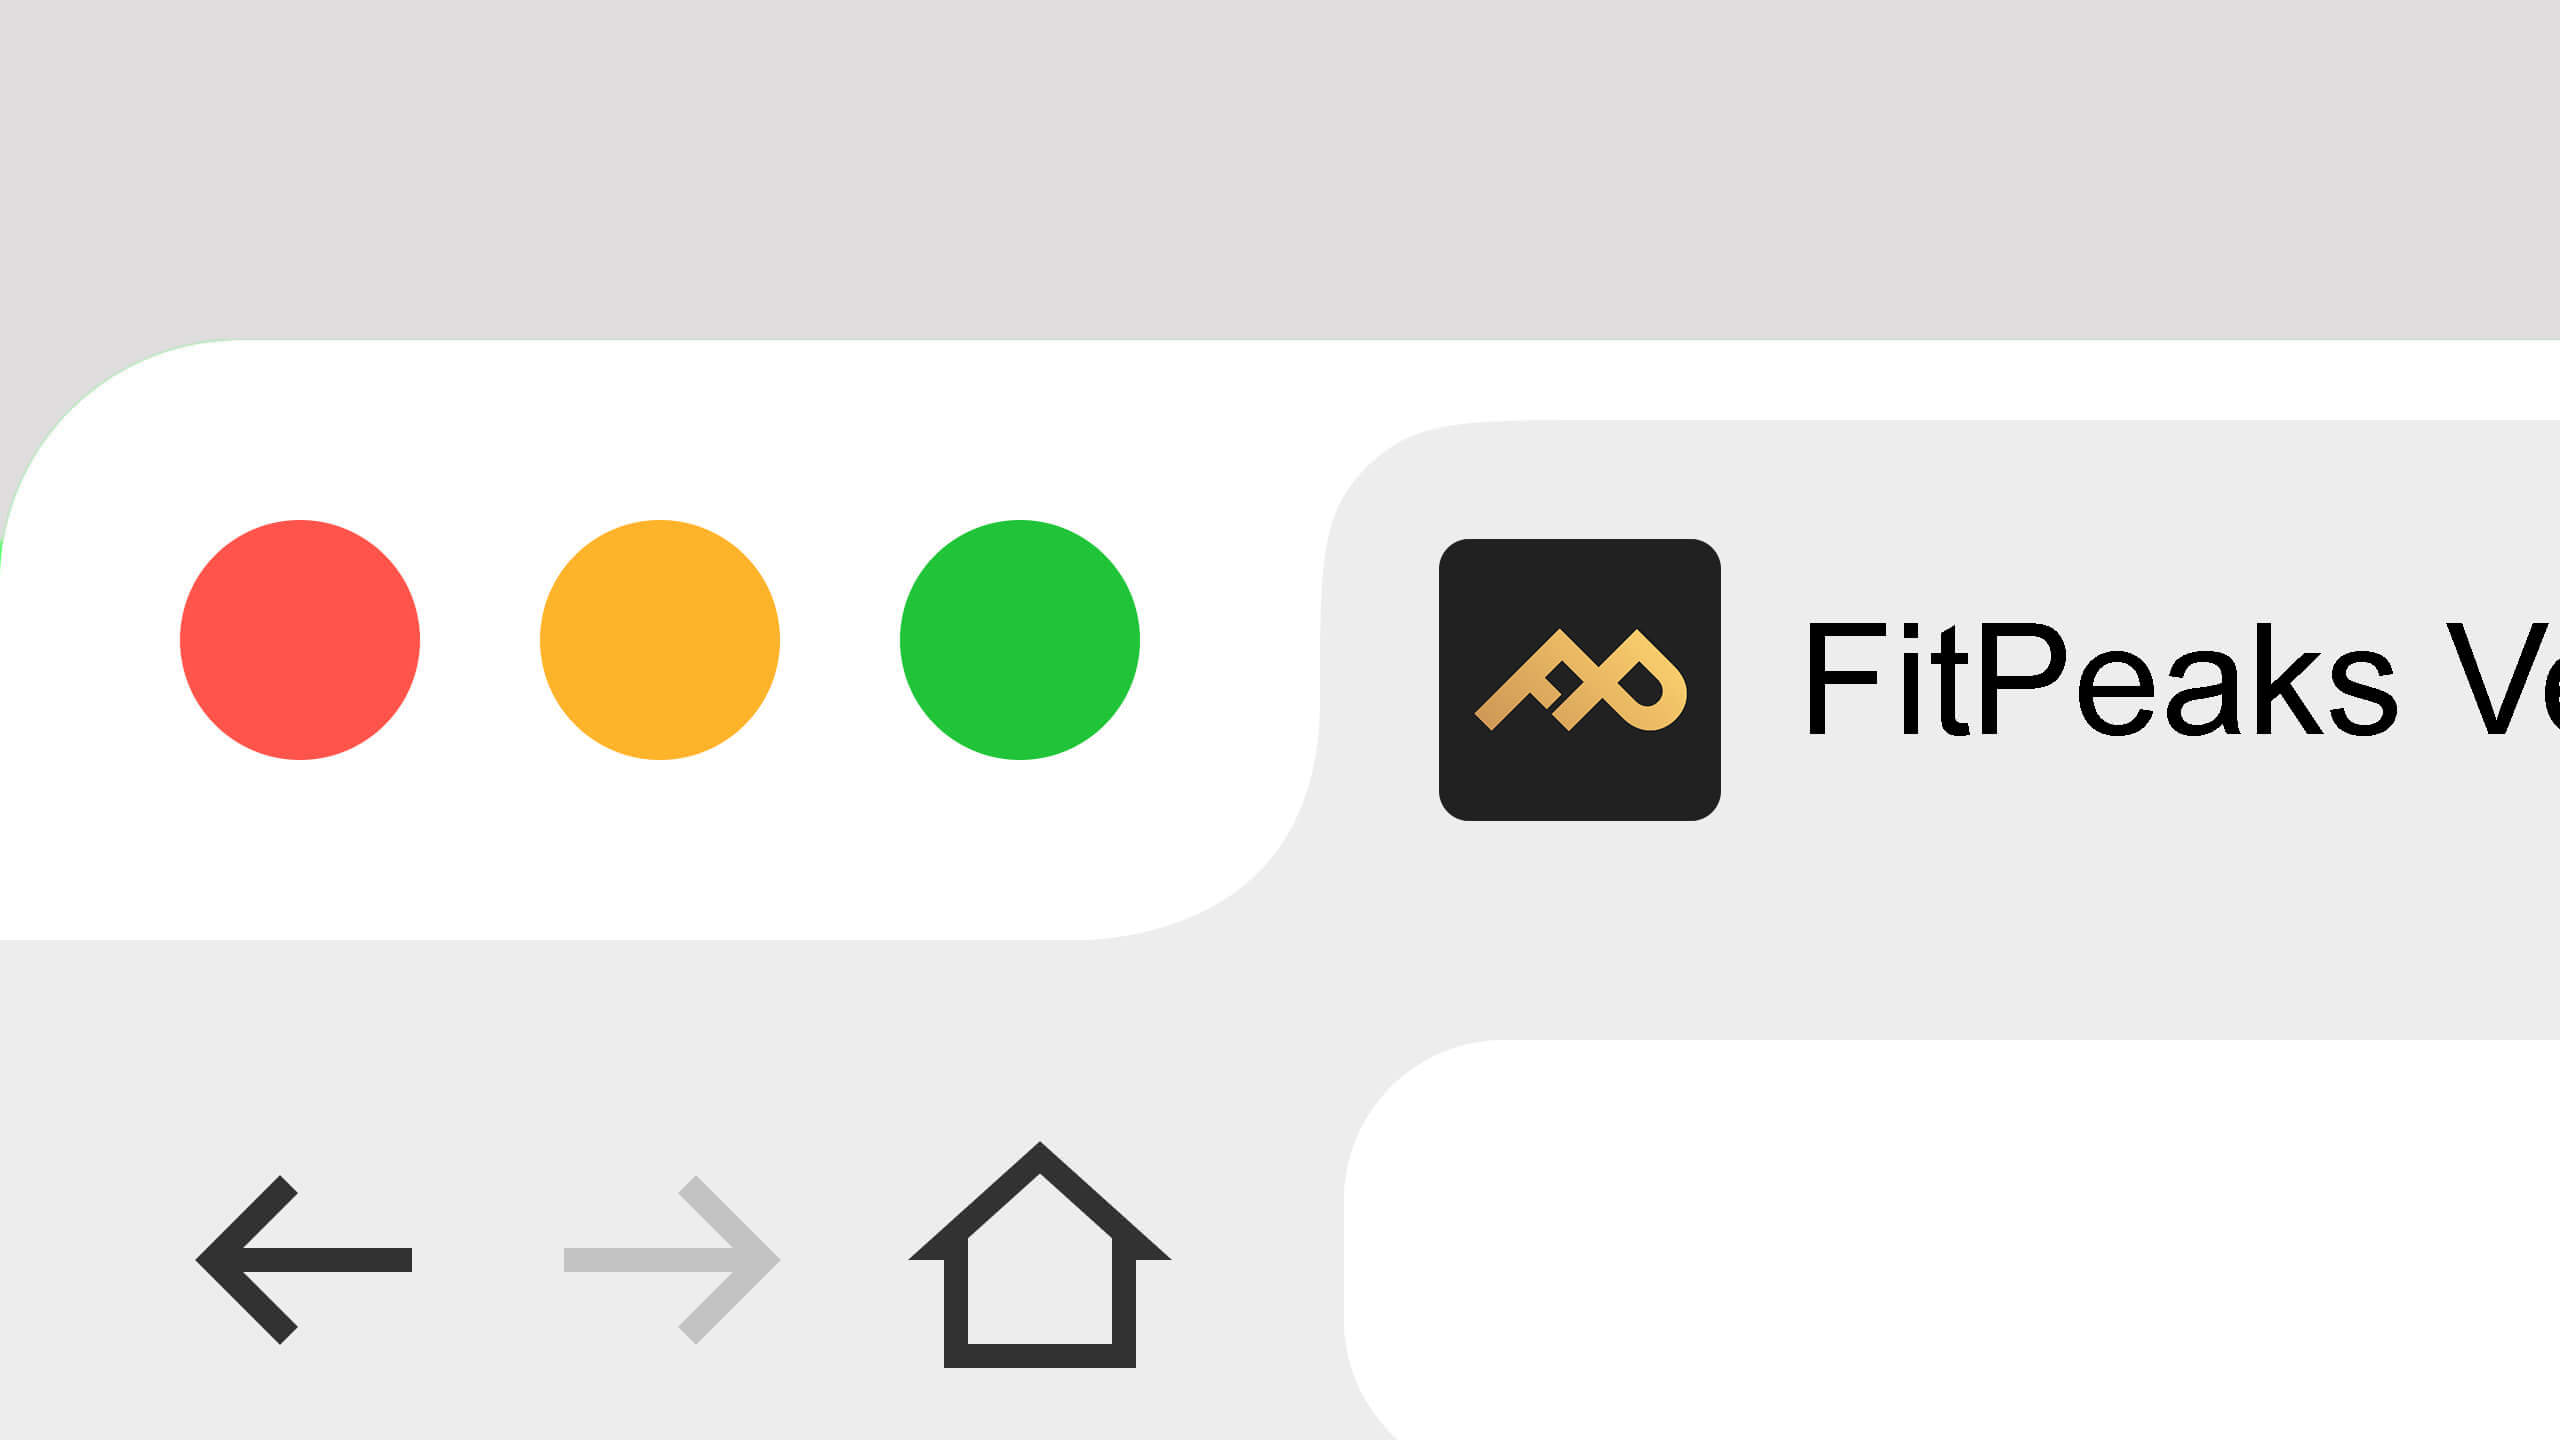 FitPeaks Favicon